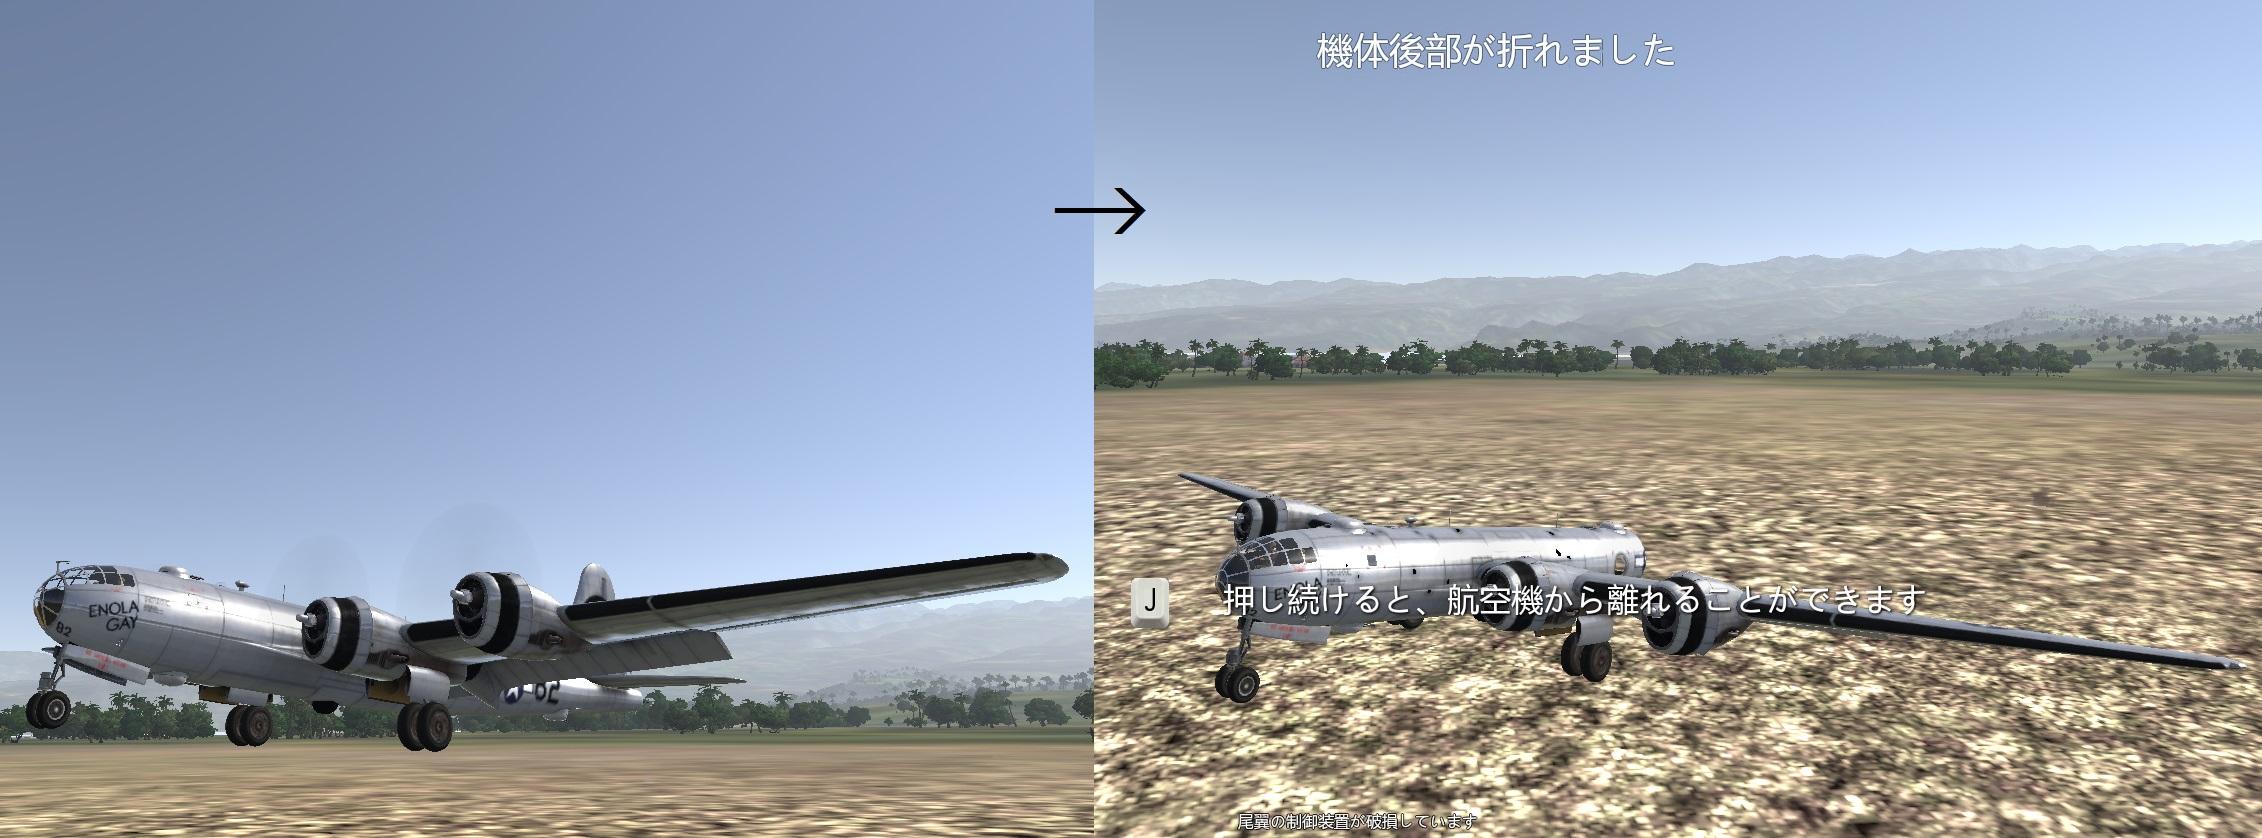 B-29_Landing.jpg